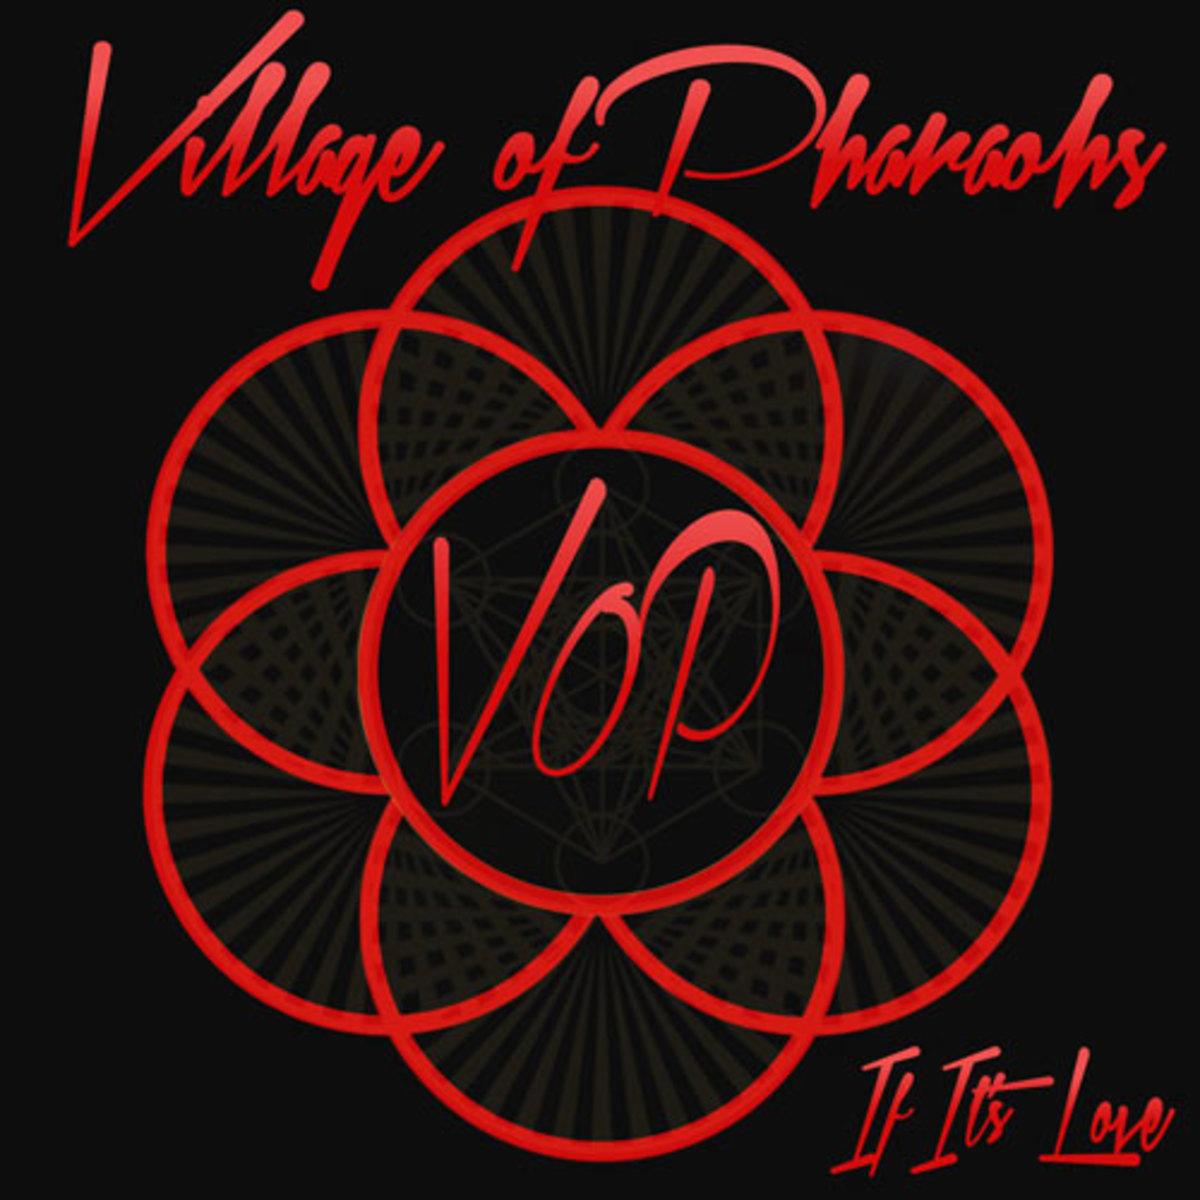 vop-ifitslove.jpg